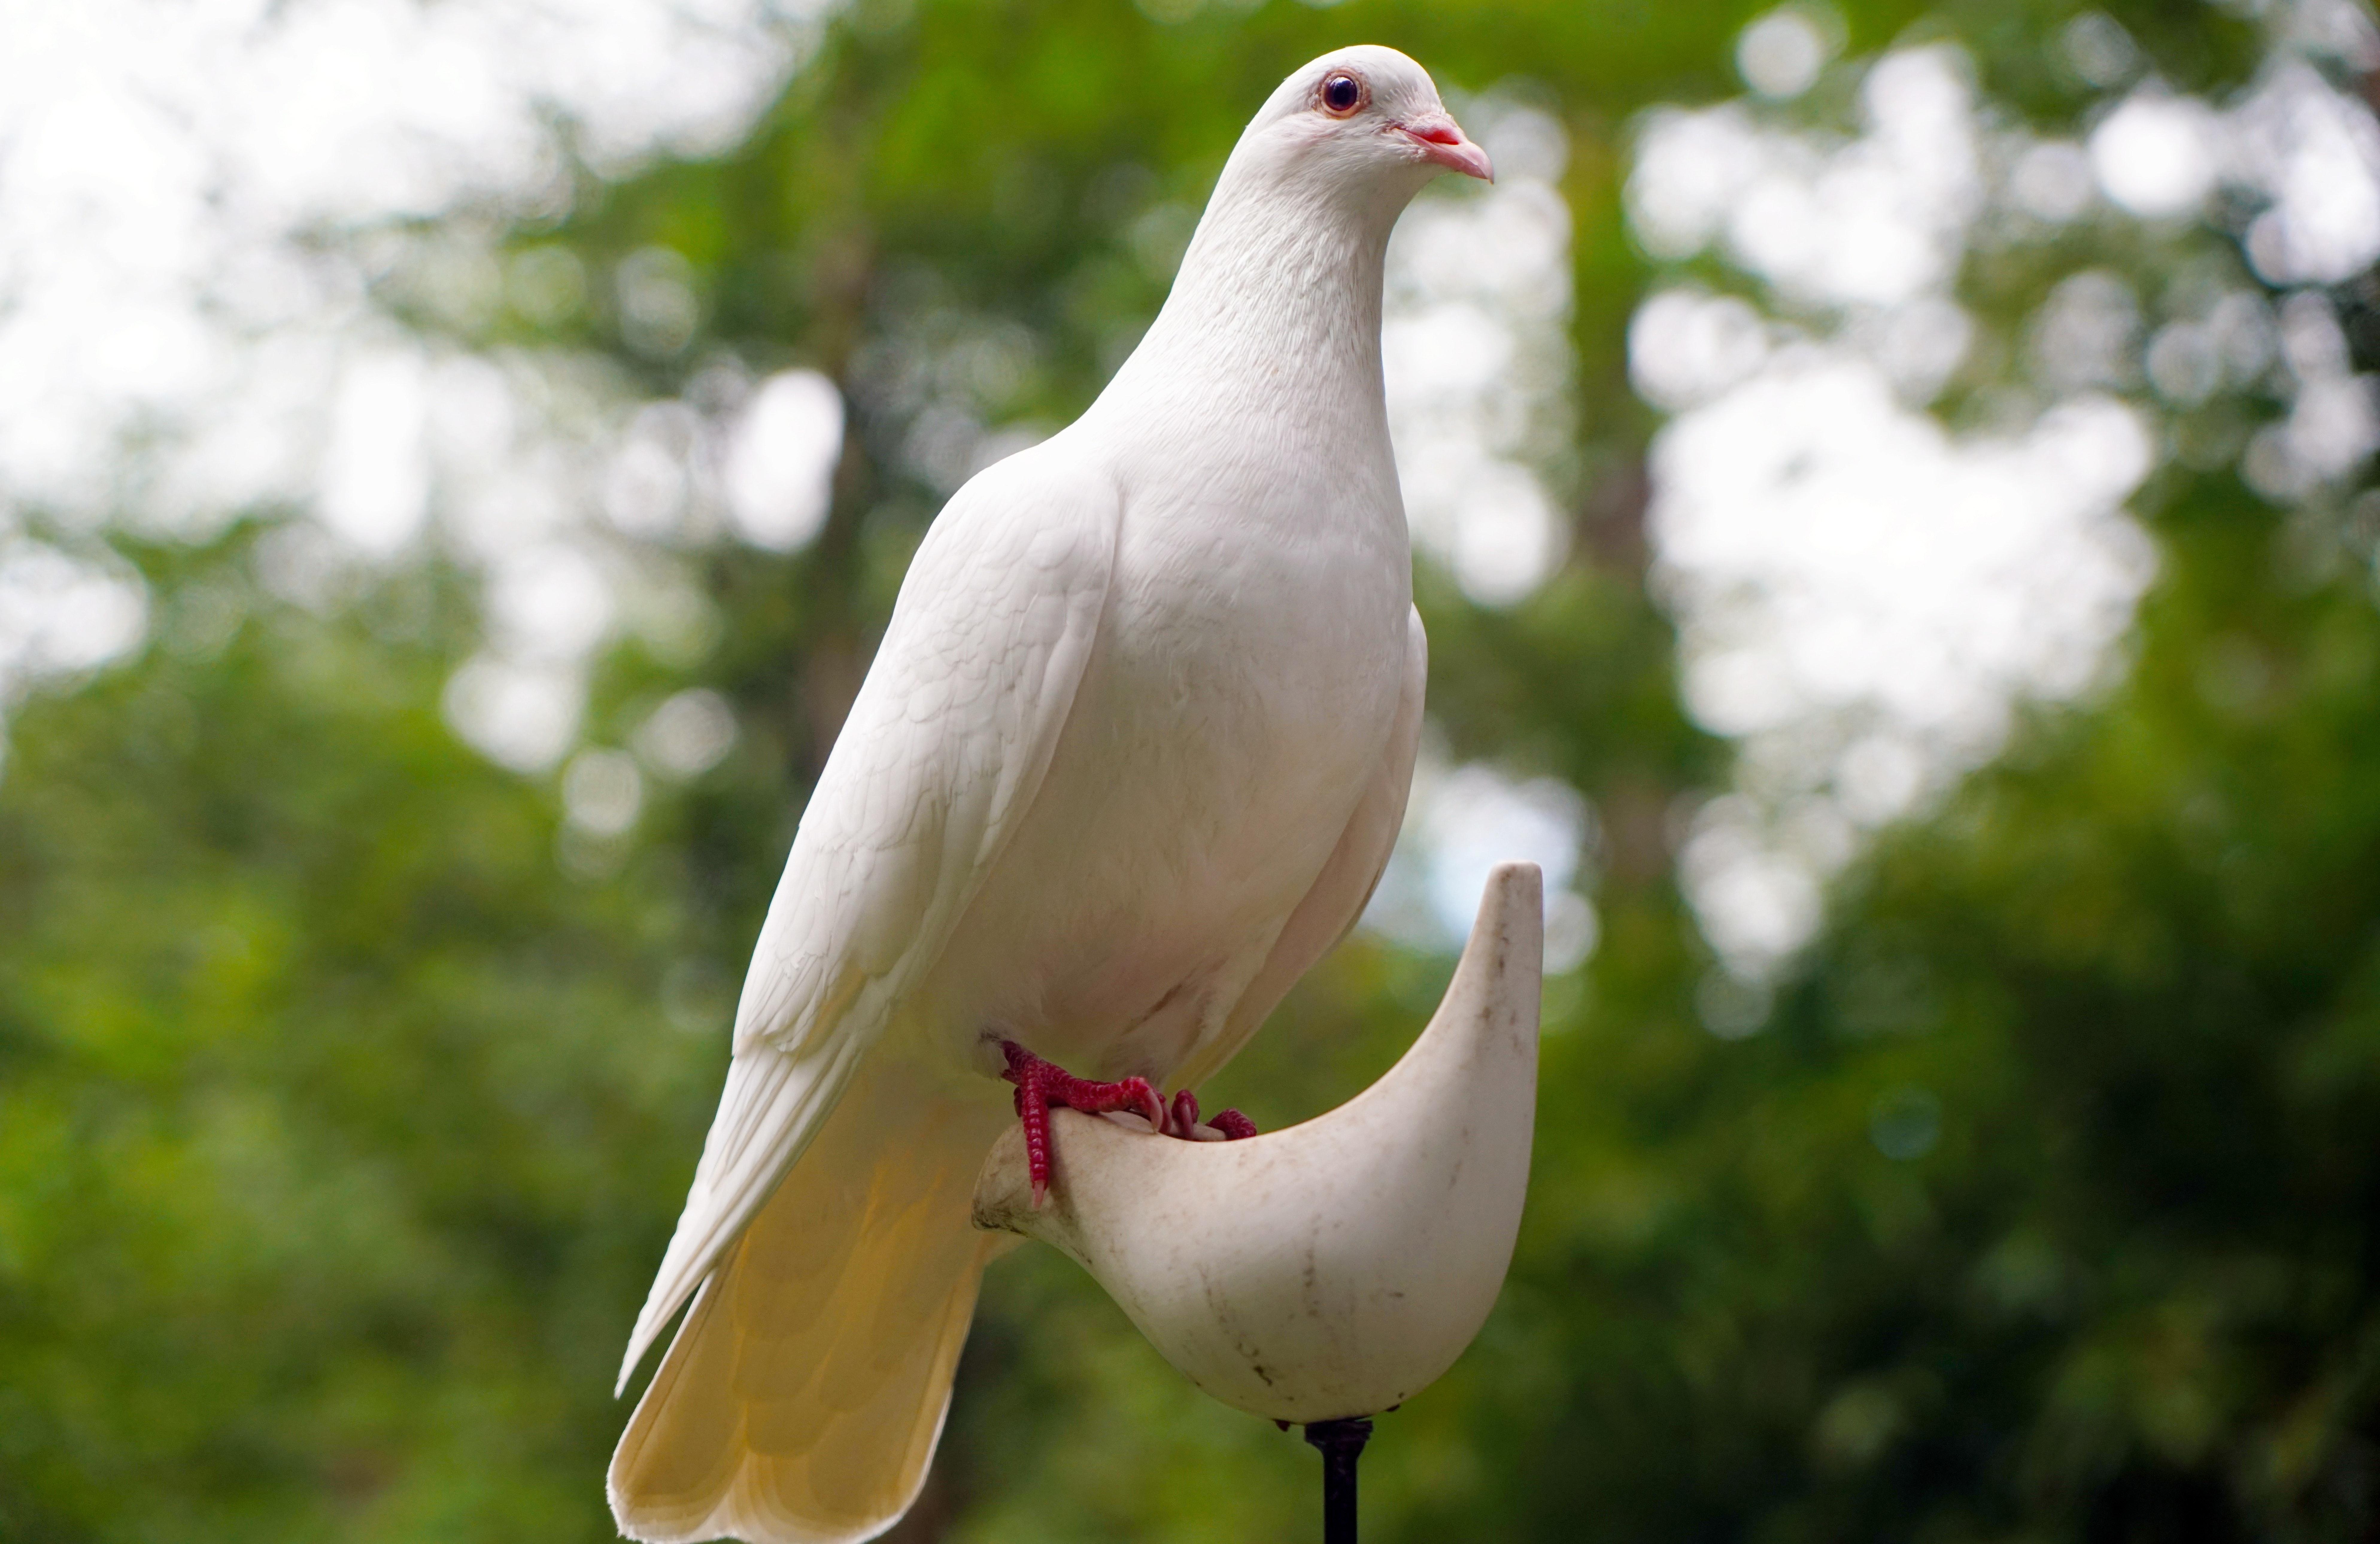 Innocent As Doves